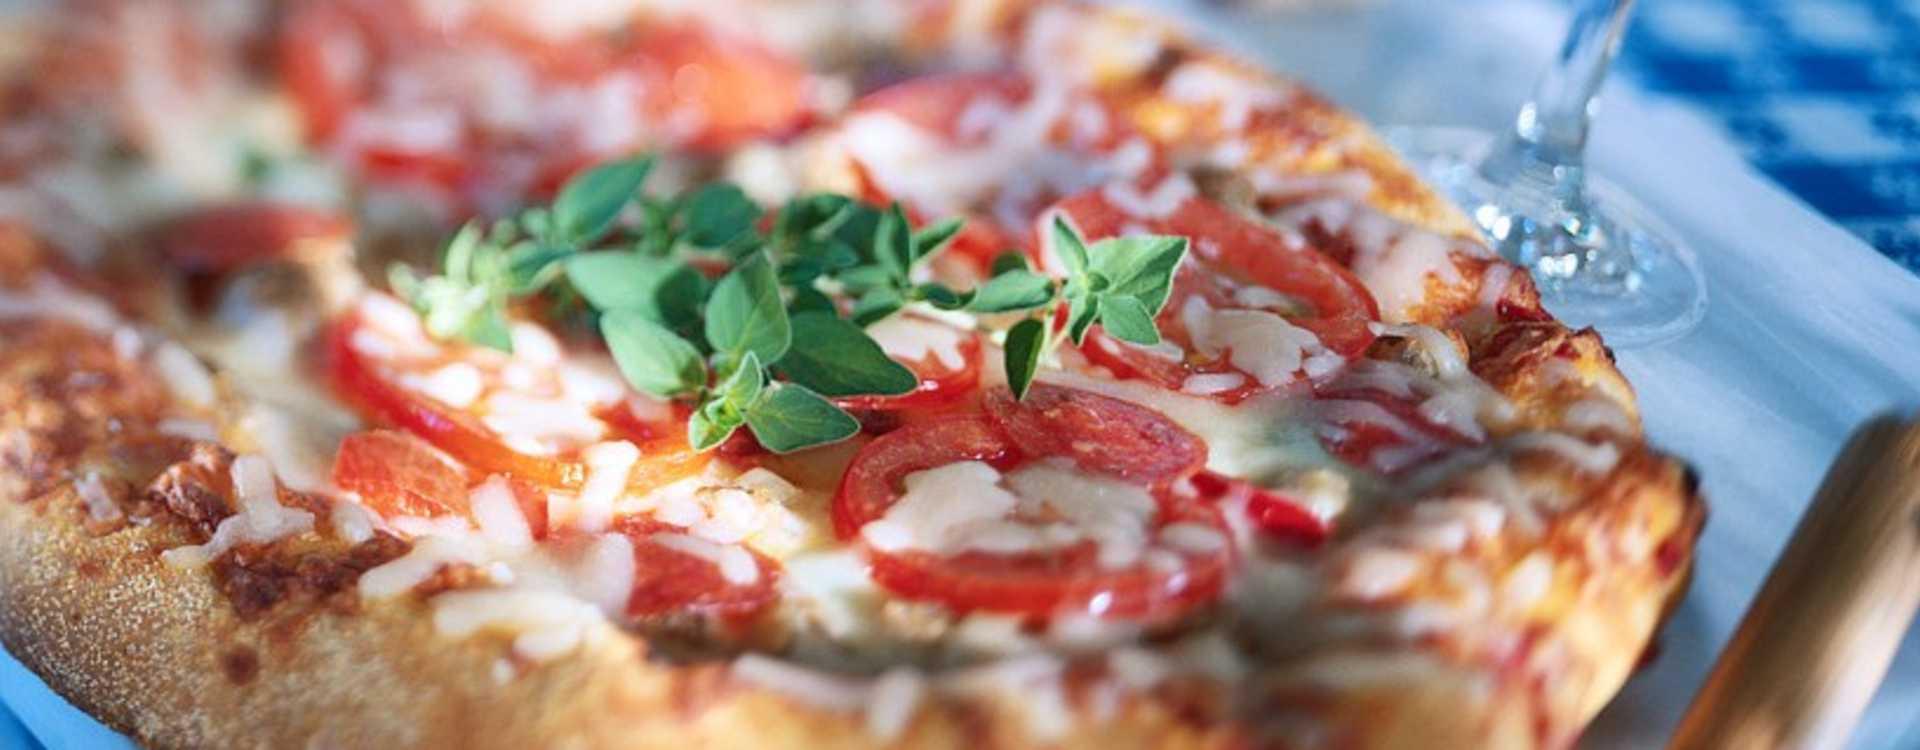 Athen's Pizza & Pasta